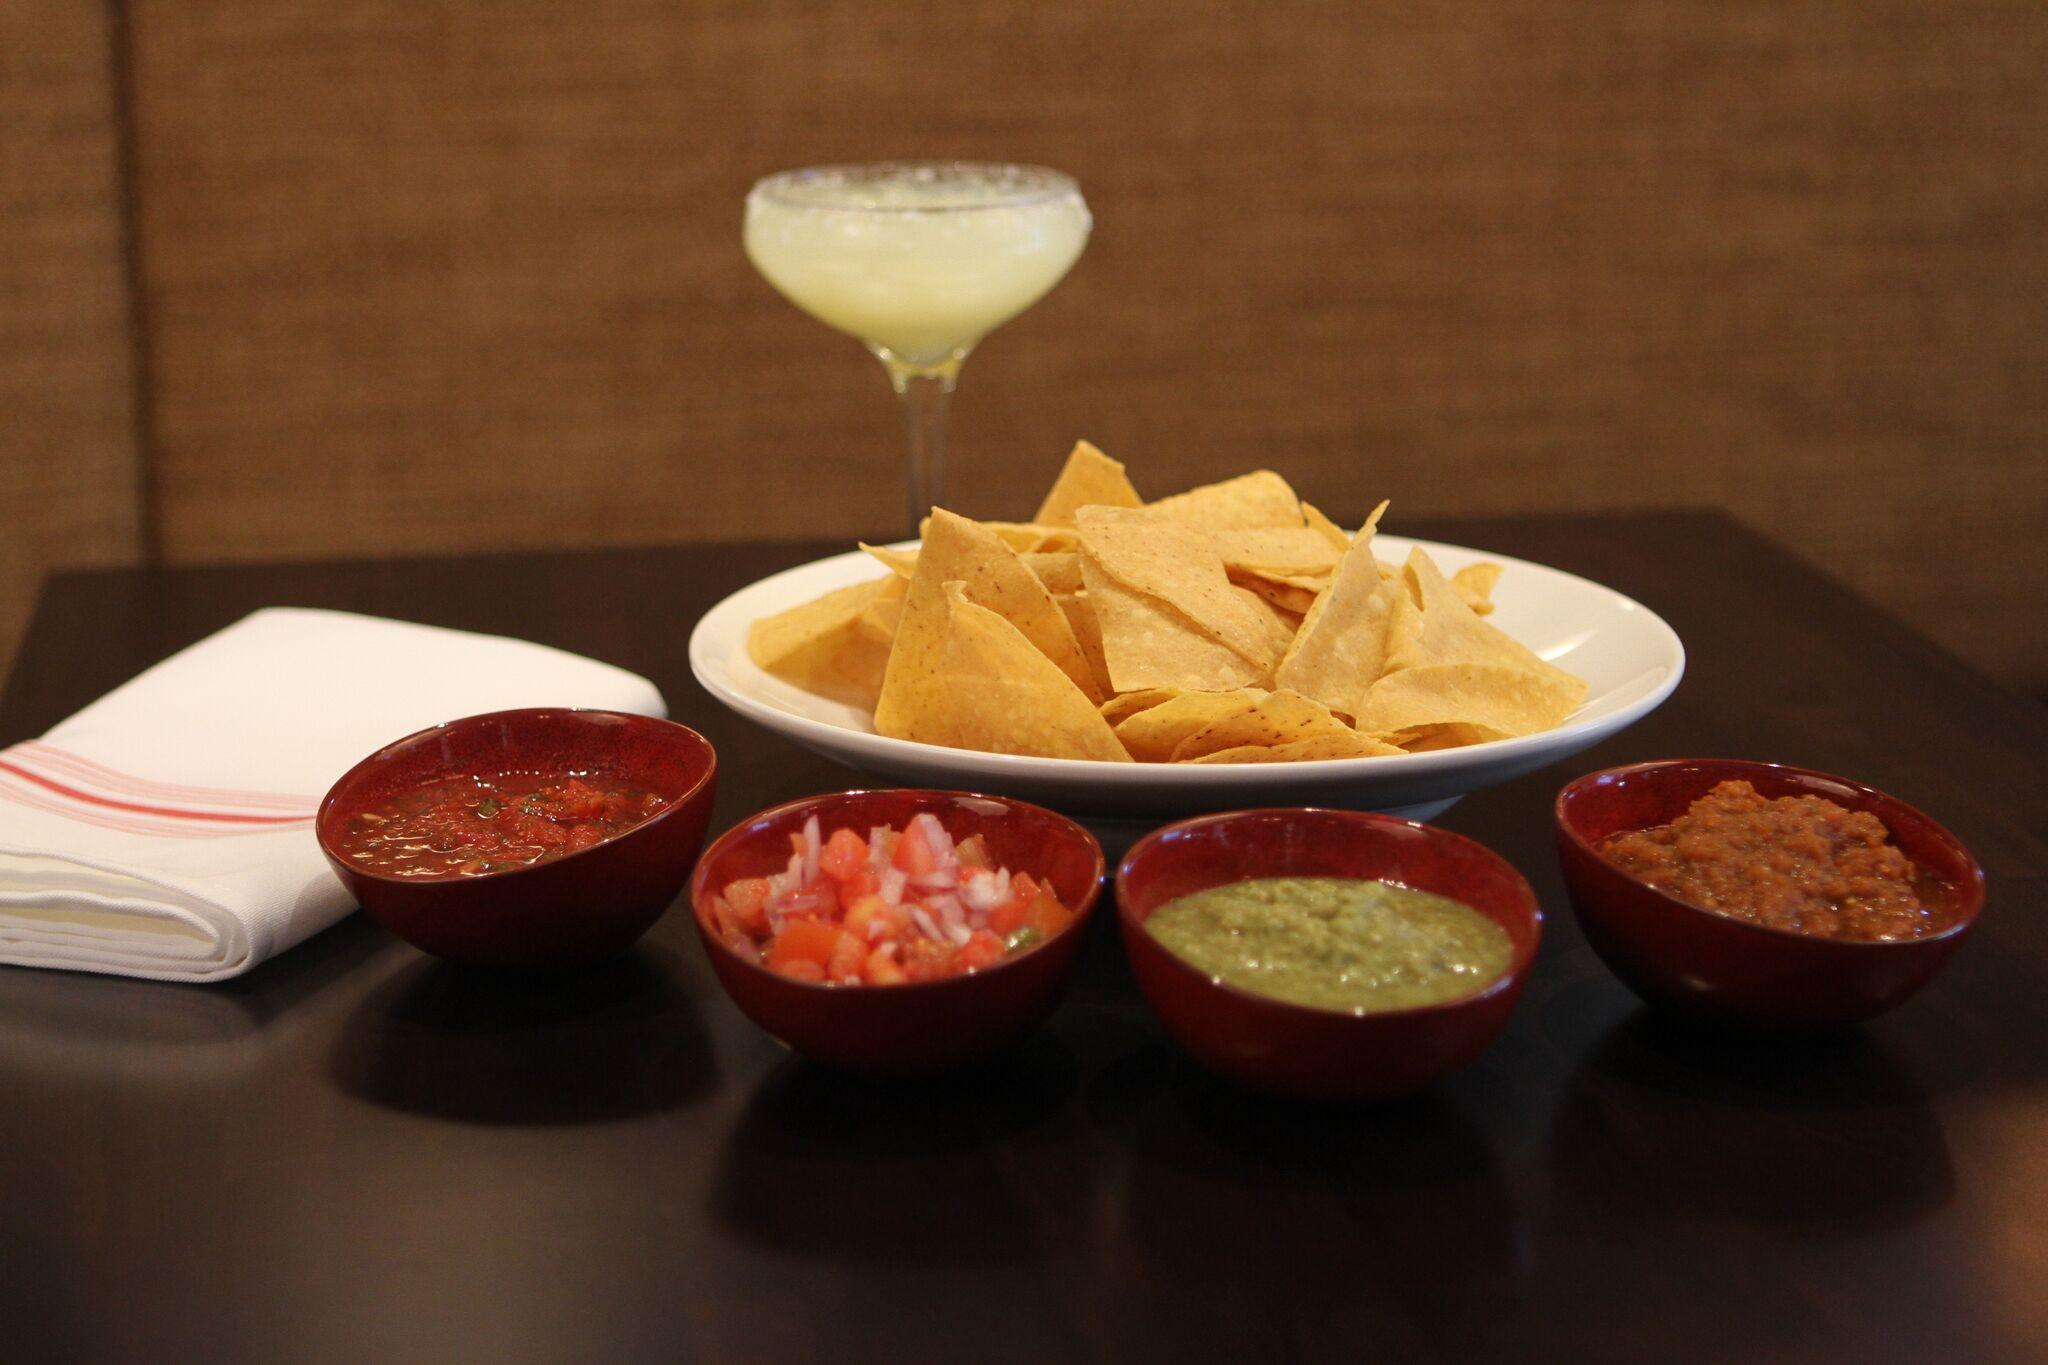 BRUNCH MENU for West Des Moines Restaurant Blu Toro Cantina + Grill Guacamole